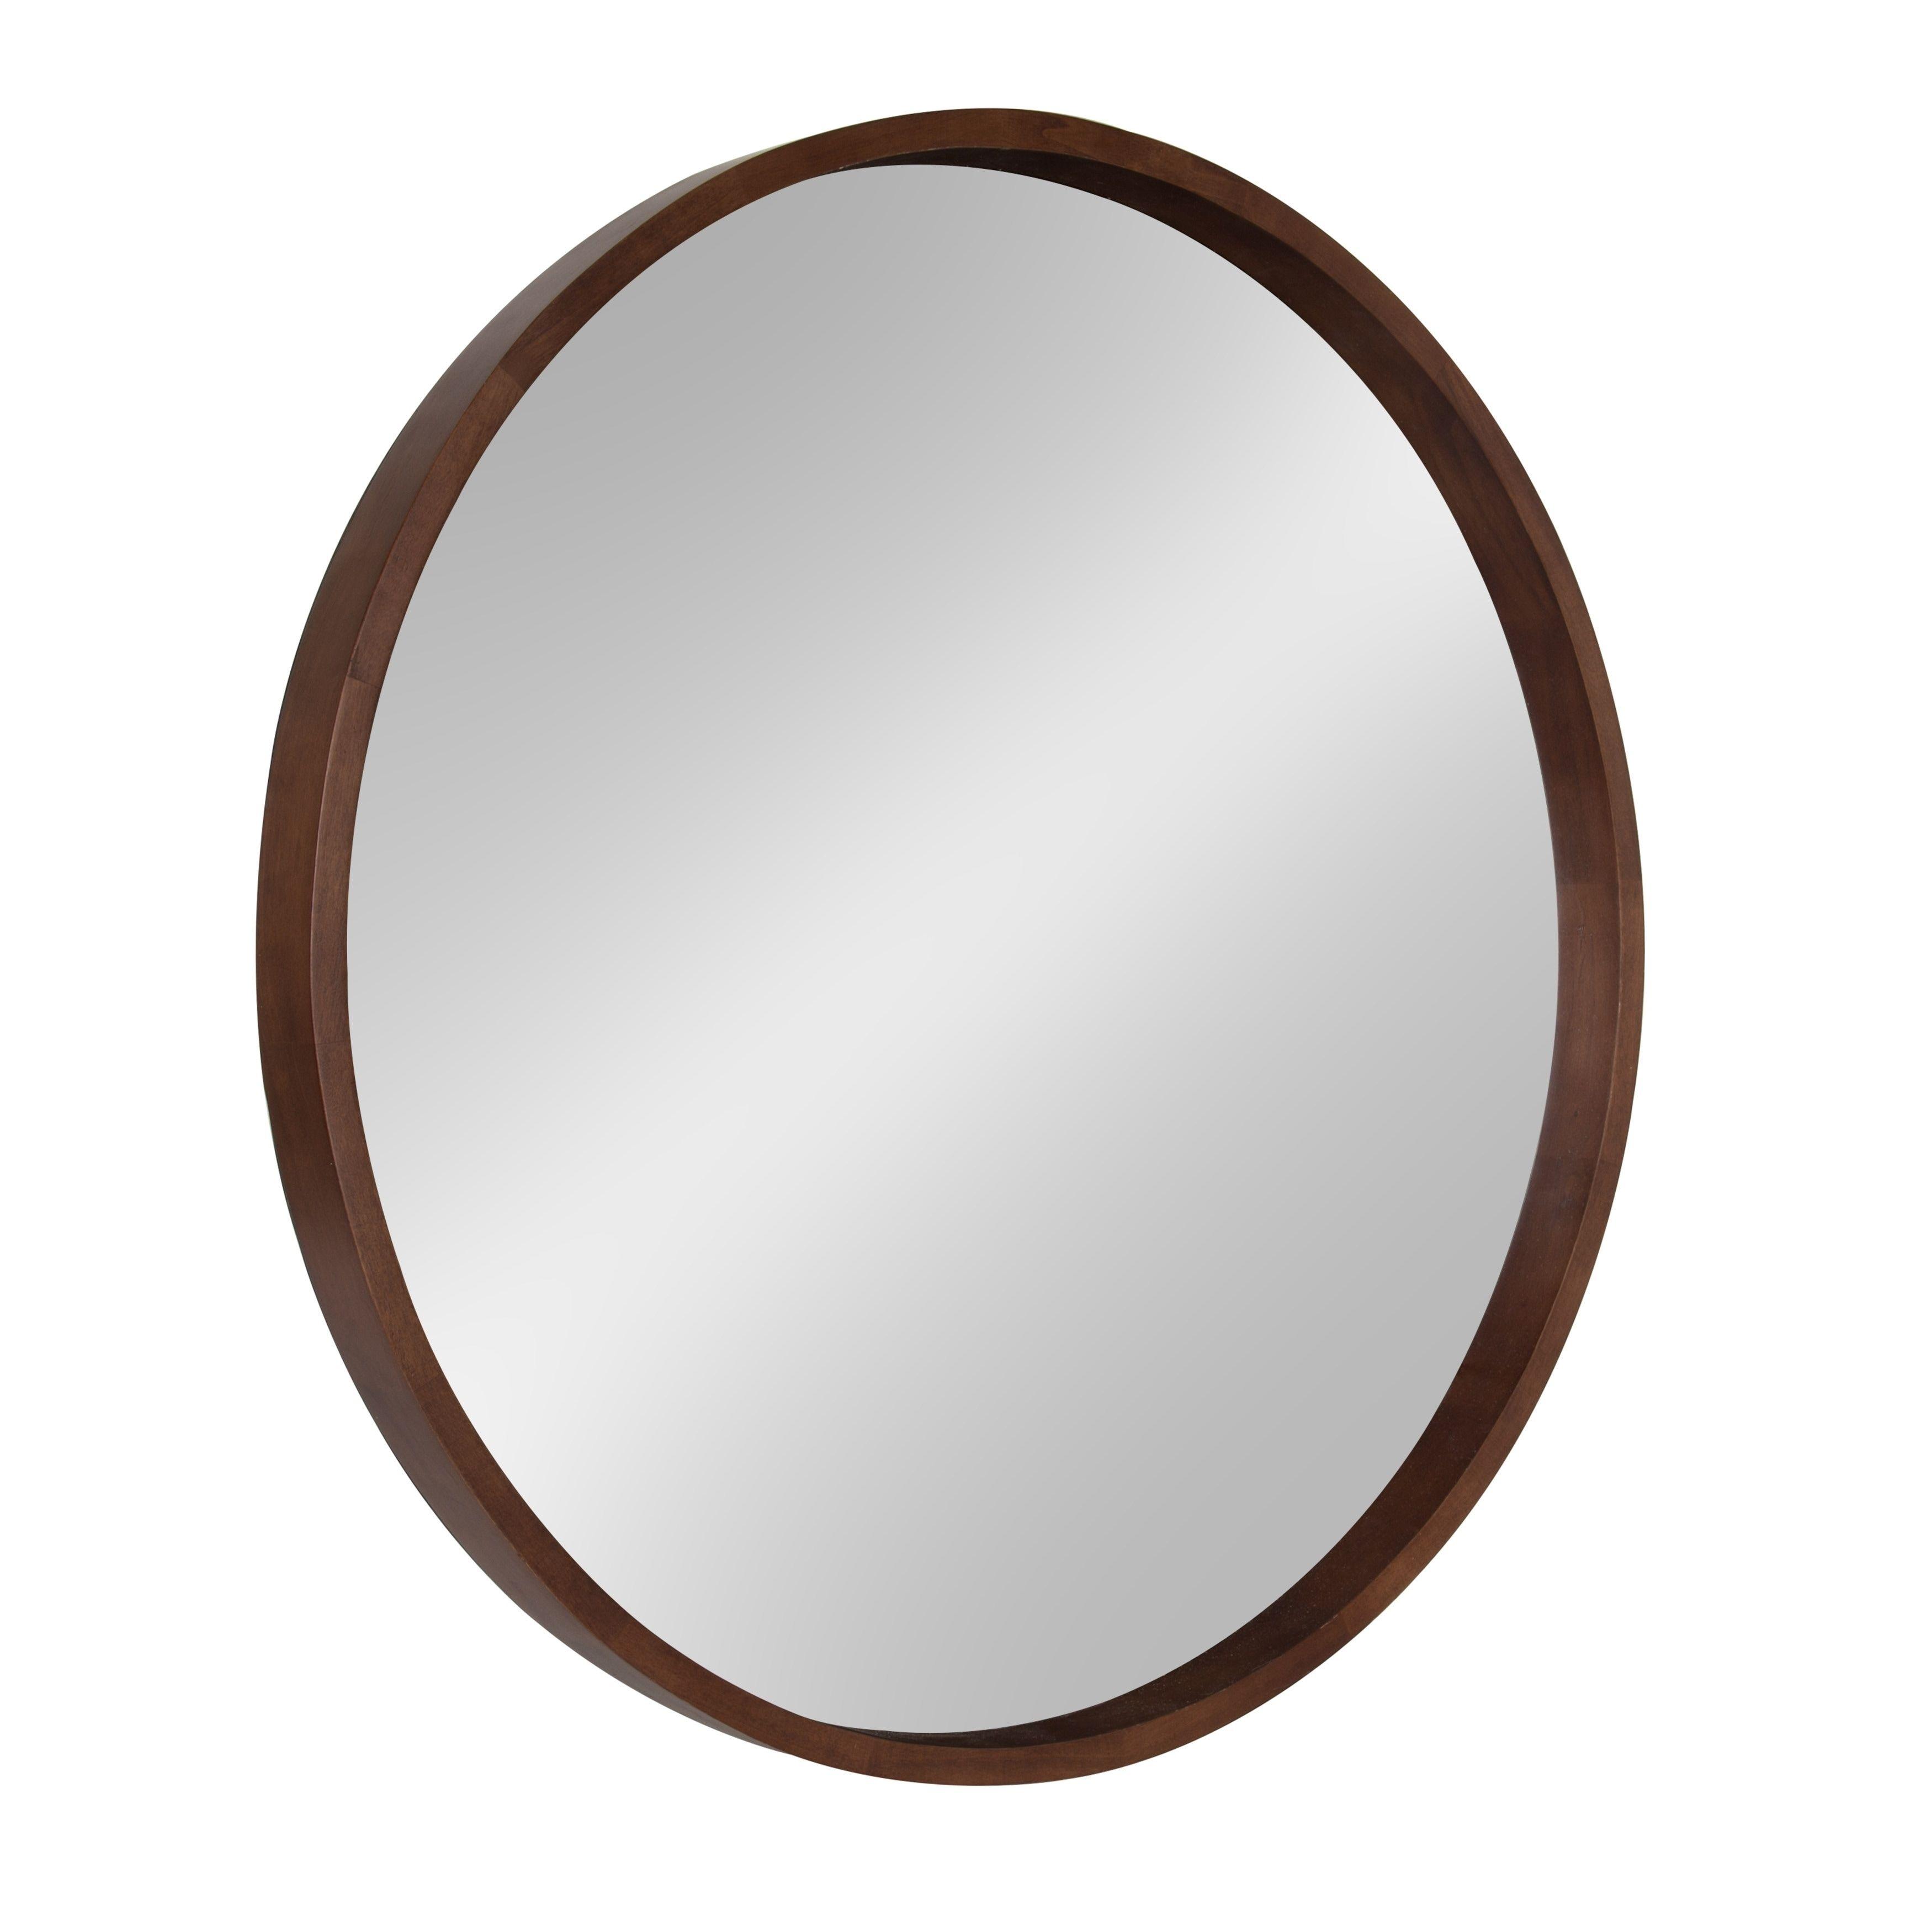 Hutton Round Decorative Wood Frame Wall Mirror 30 Inch